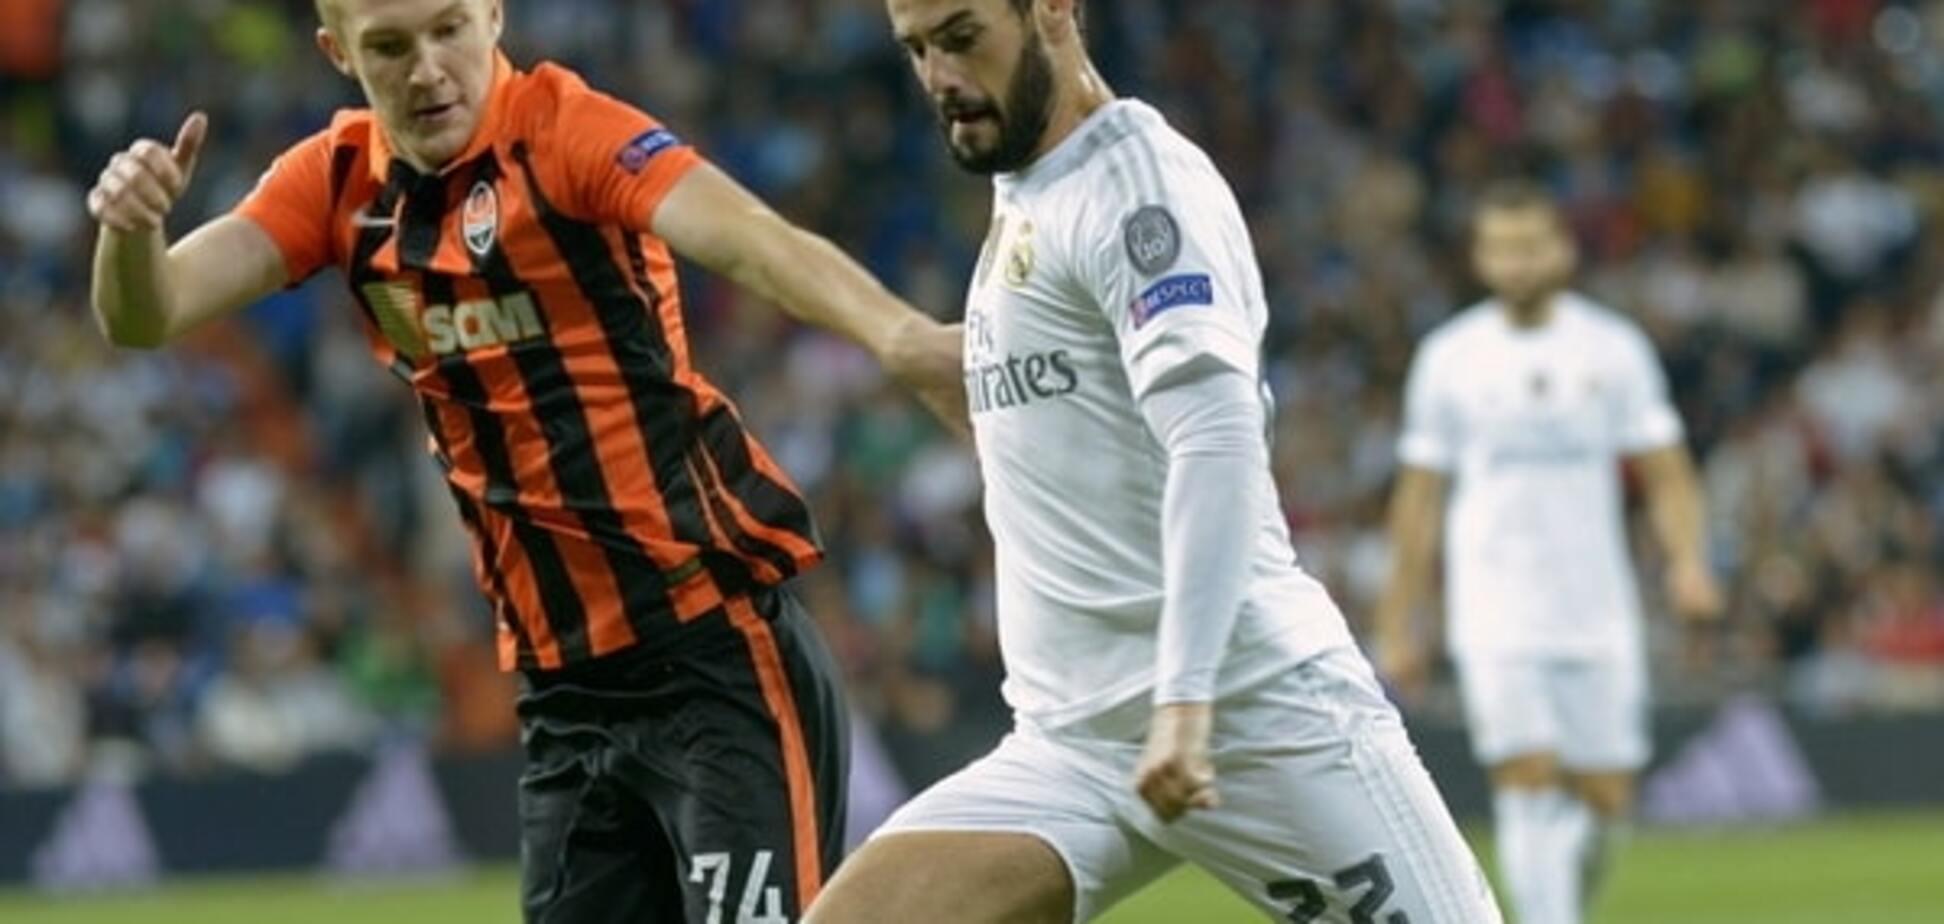 'Шахтер' благодаря судье разгромно проиграл 'Реалу' в Лиге чемпионов